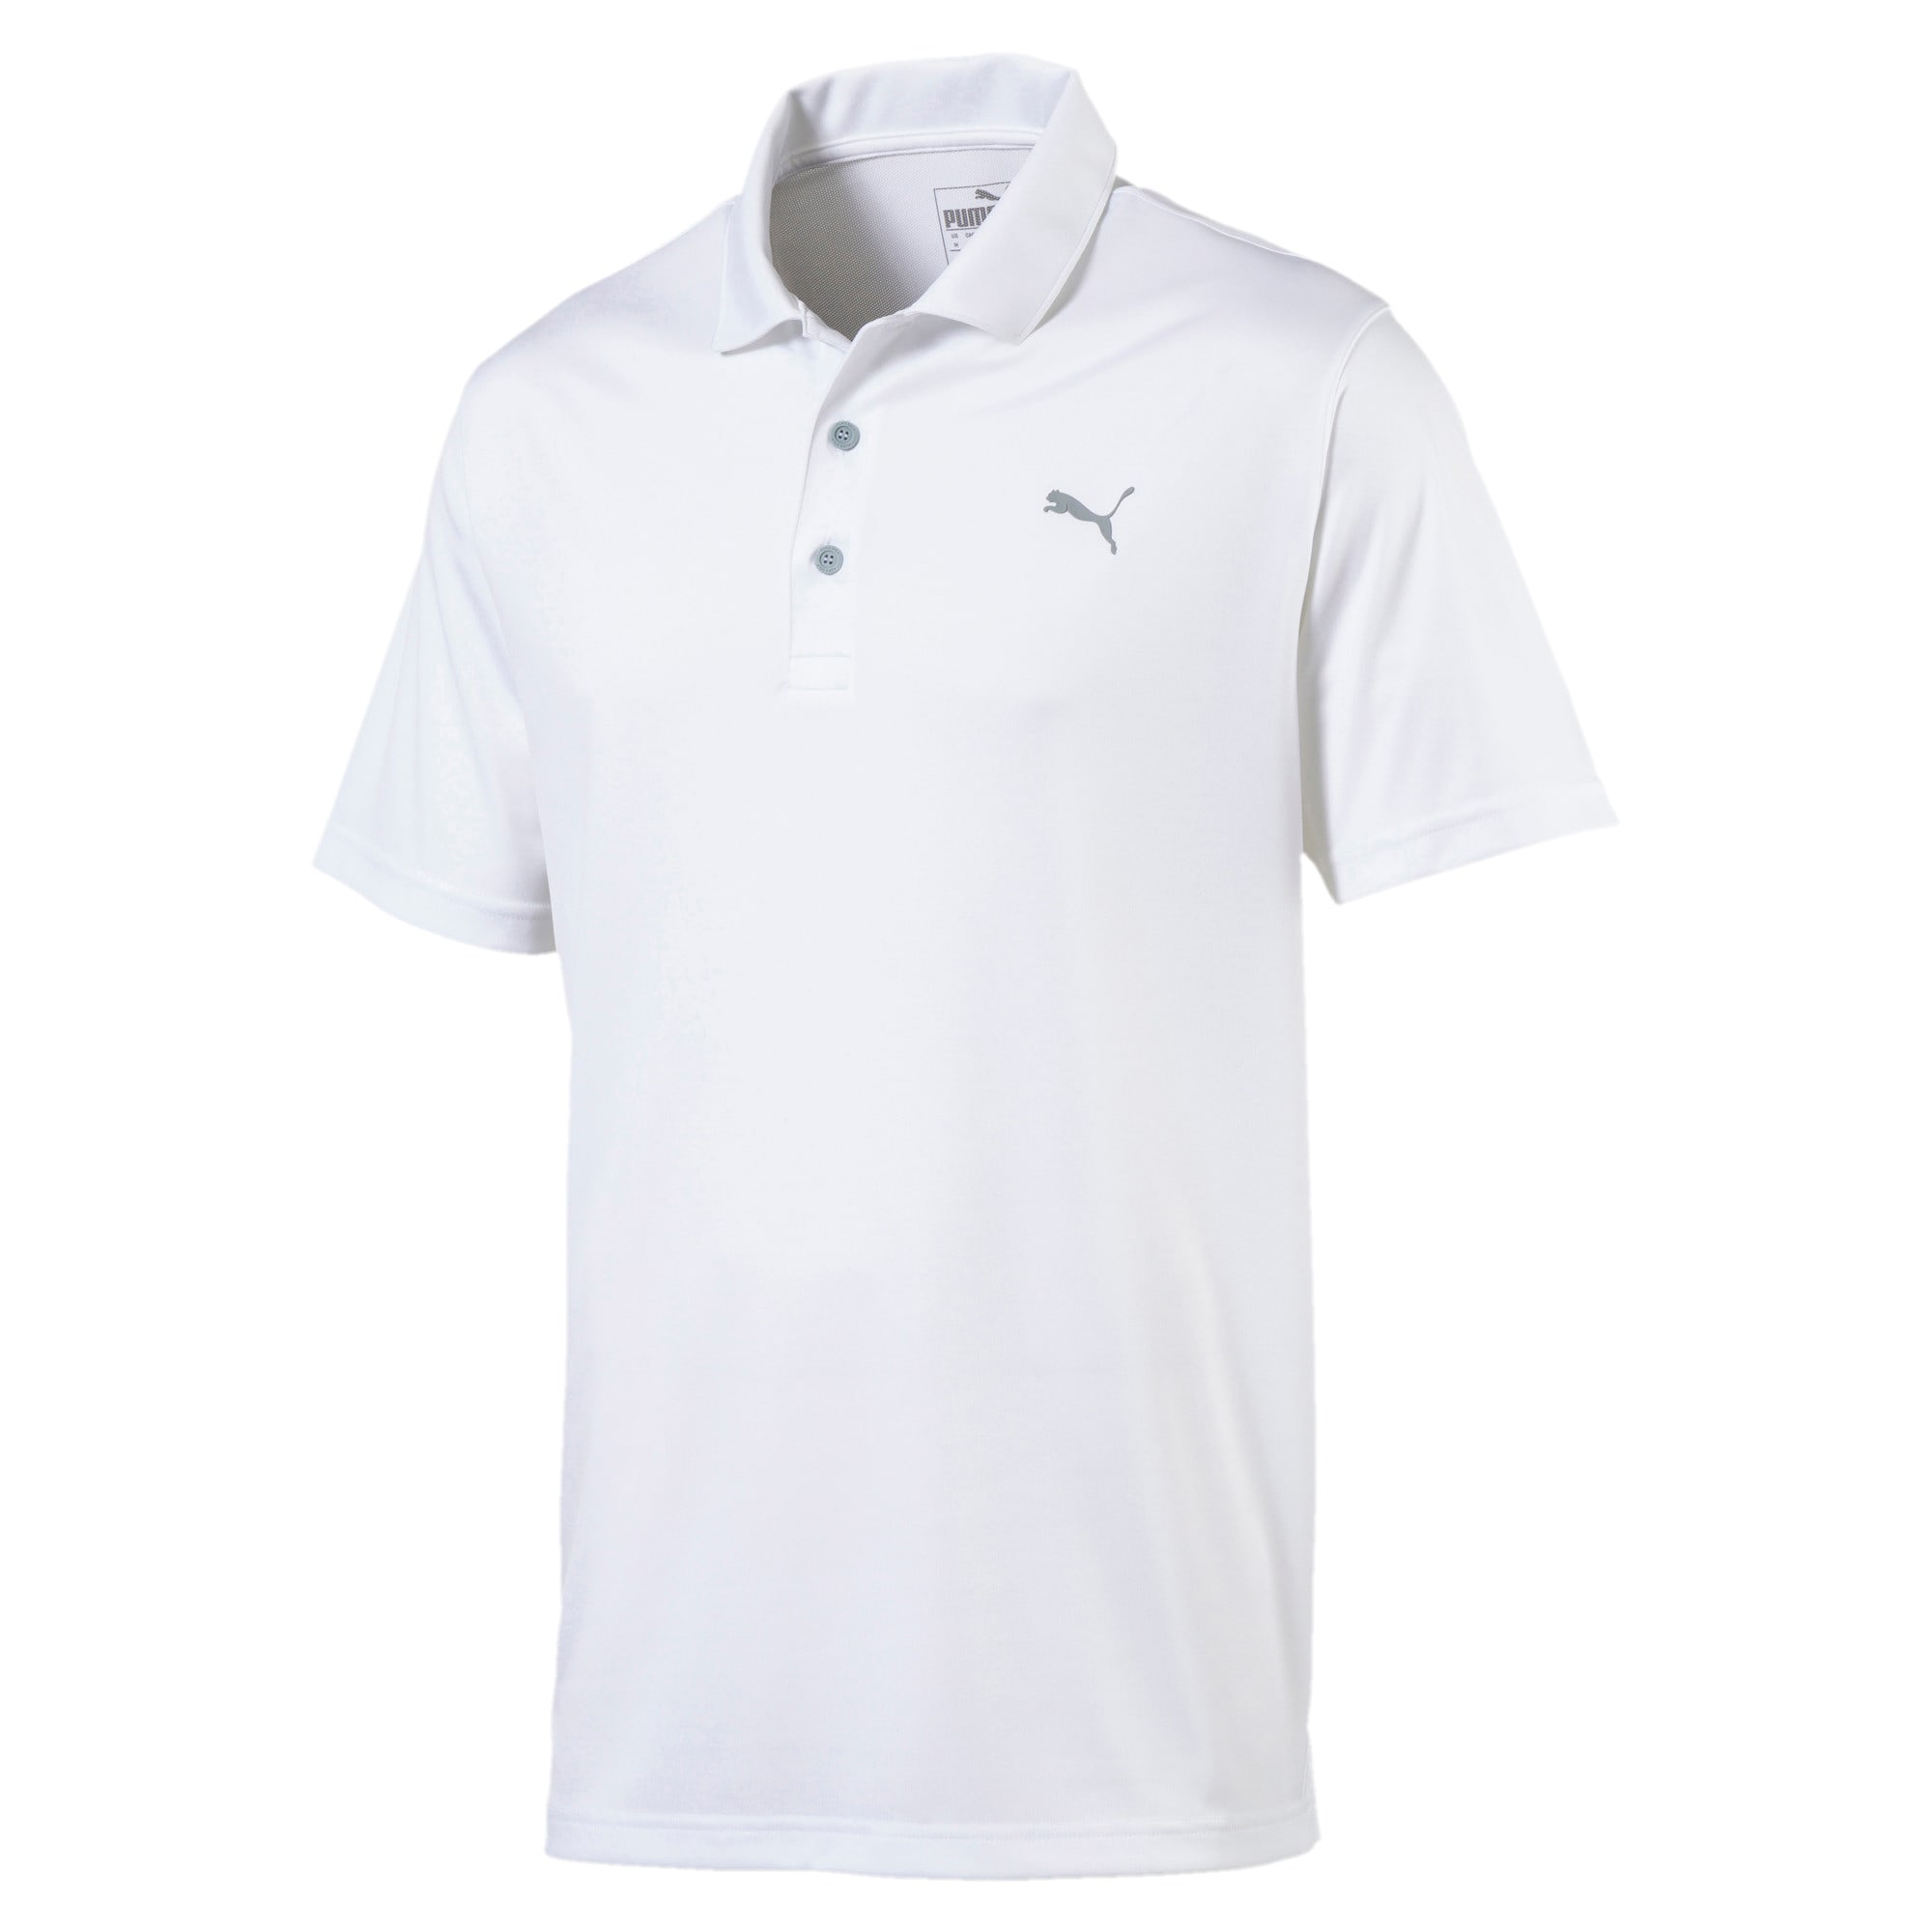 Thumbnail 4 of Rotation Men's Golf Polo, Bright White, medium